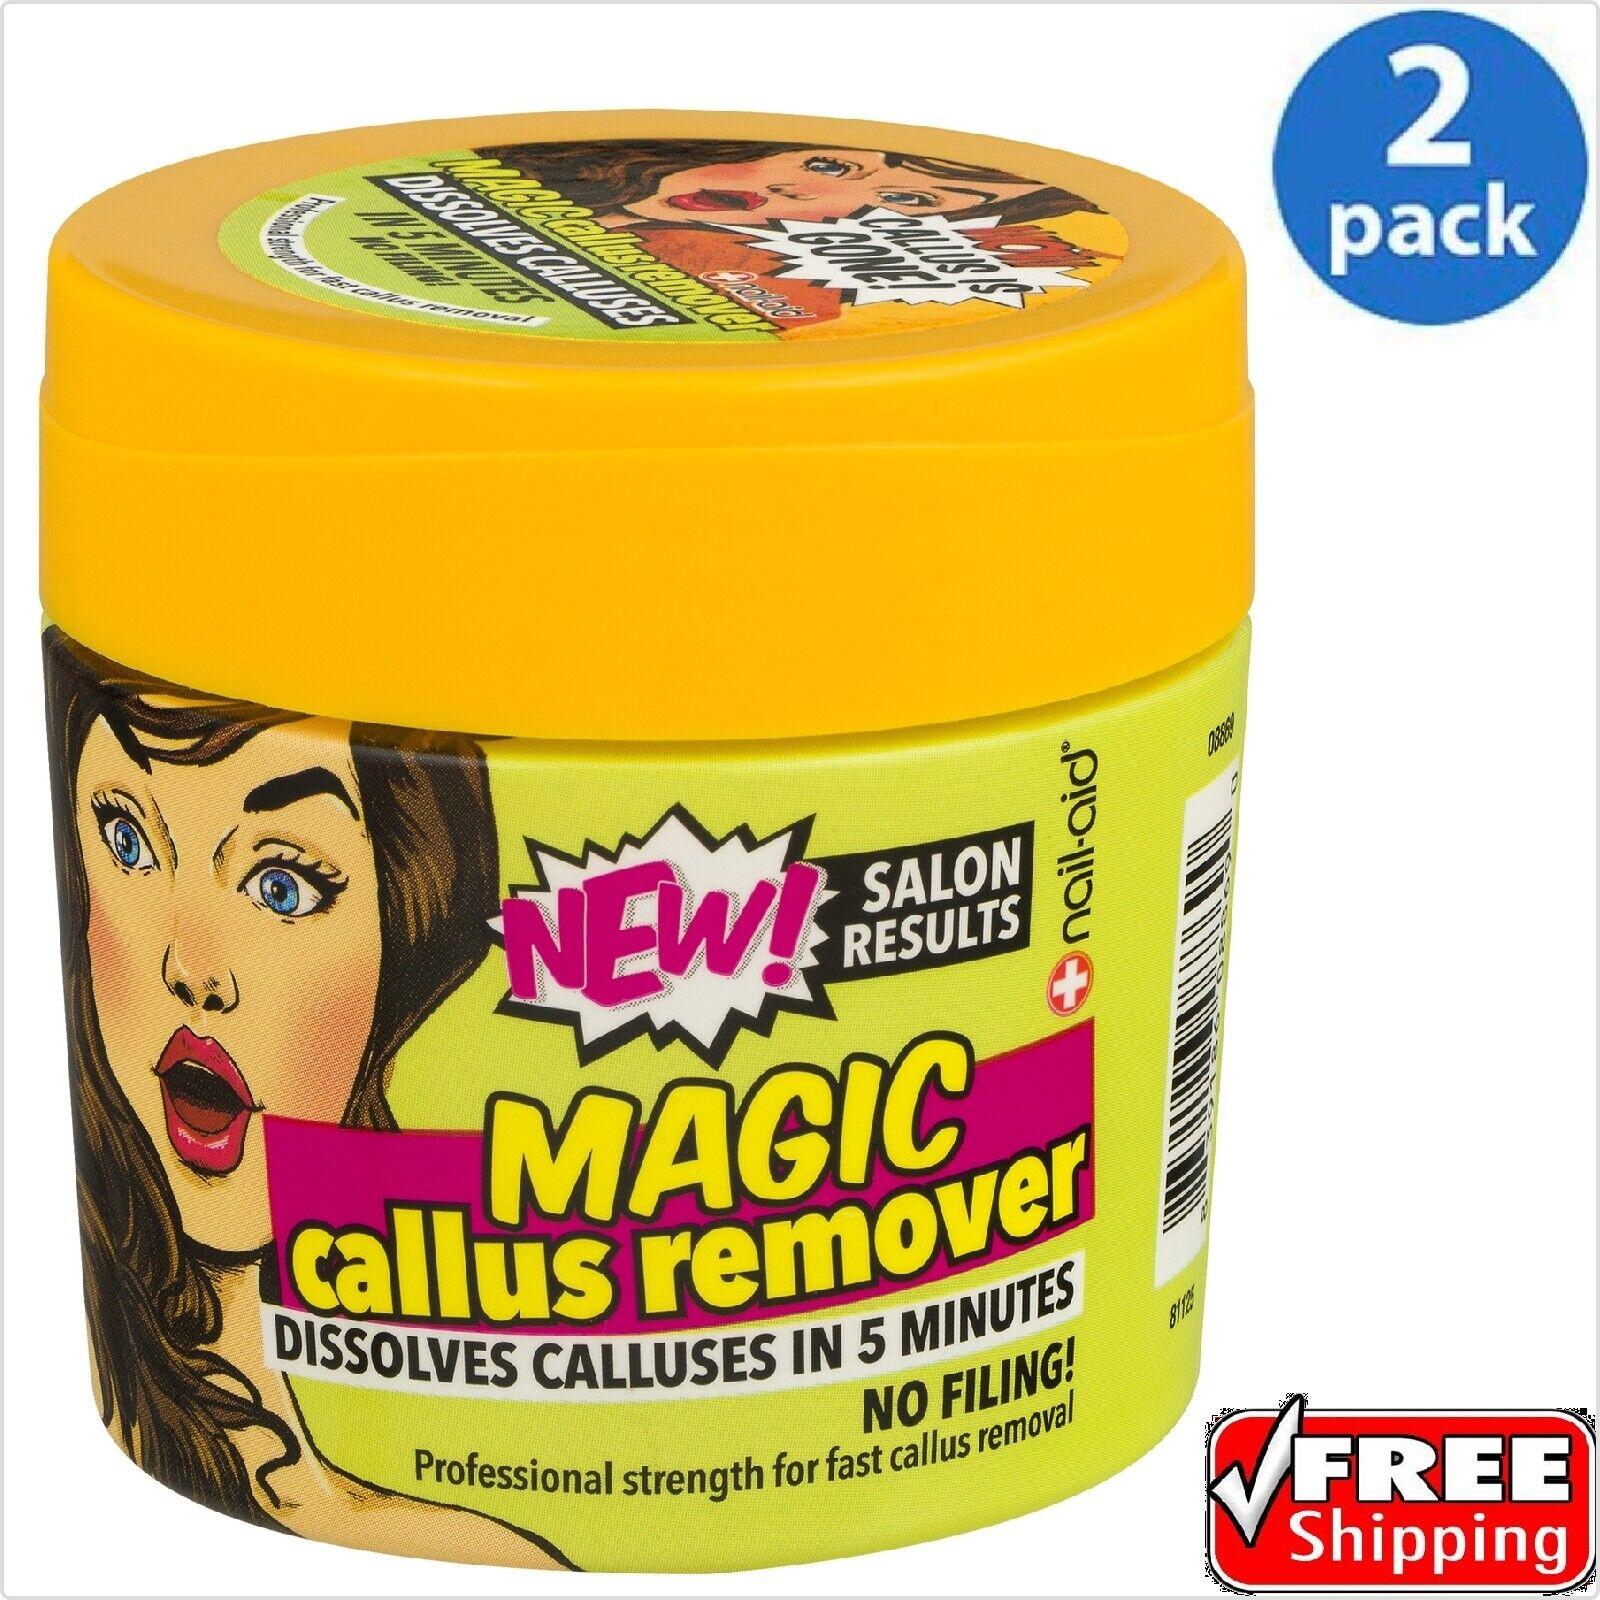 Nail-Aid ® Magic Callus Remover 4.3 Fl Oz - 2 PACK - Free 2